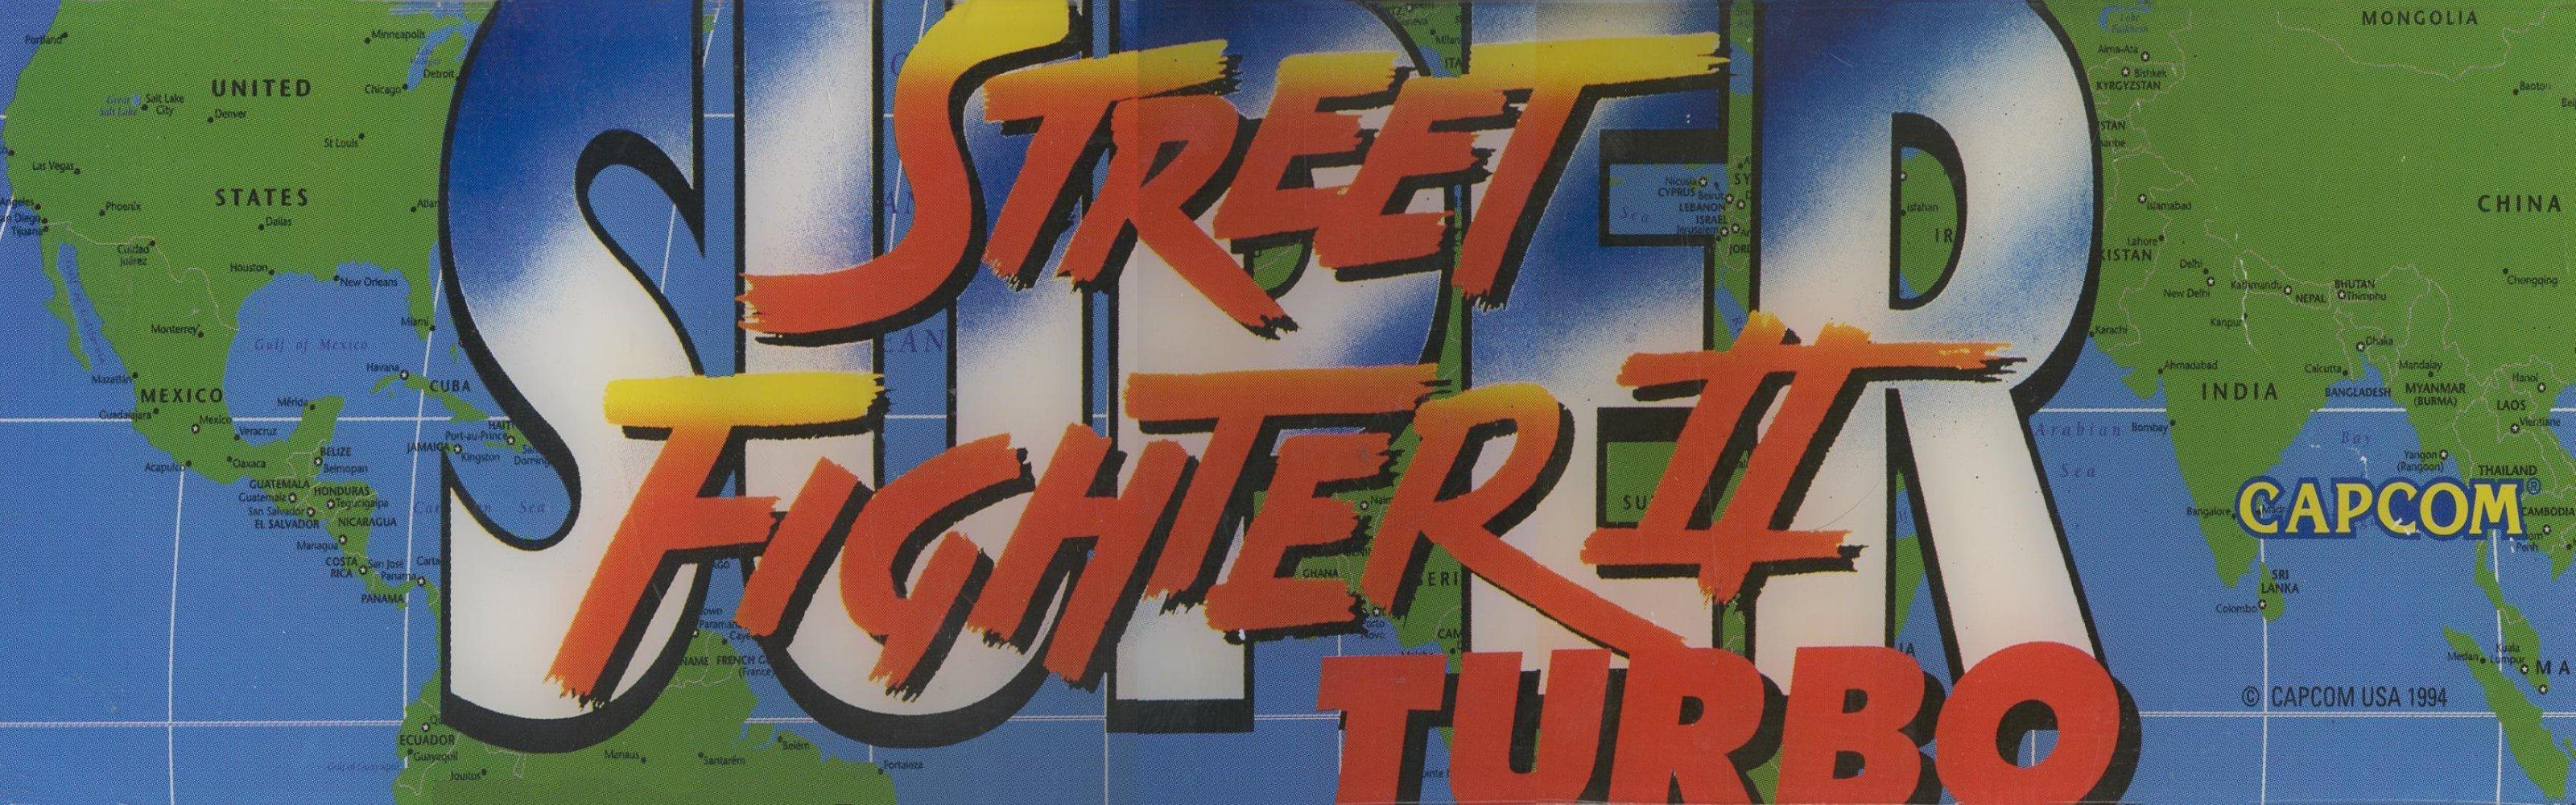 Super Street Fighter Ii Turbo Details Launchbox Games